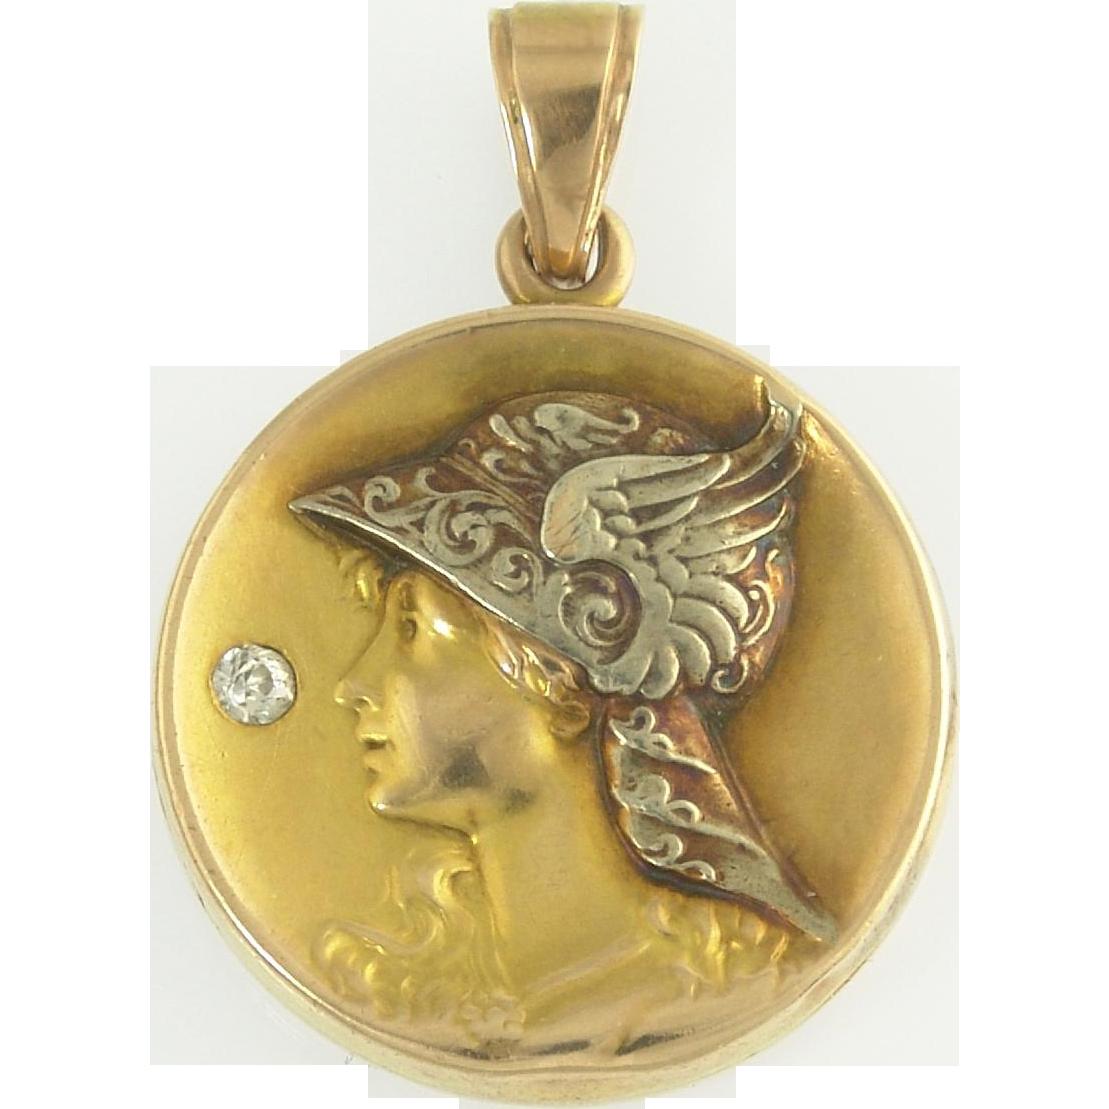 Spirited Diamond Art Nouveau Locket of Mercury in Bi-Color 14k Gold